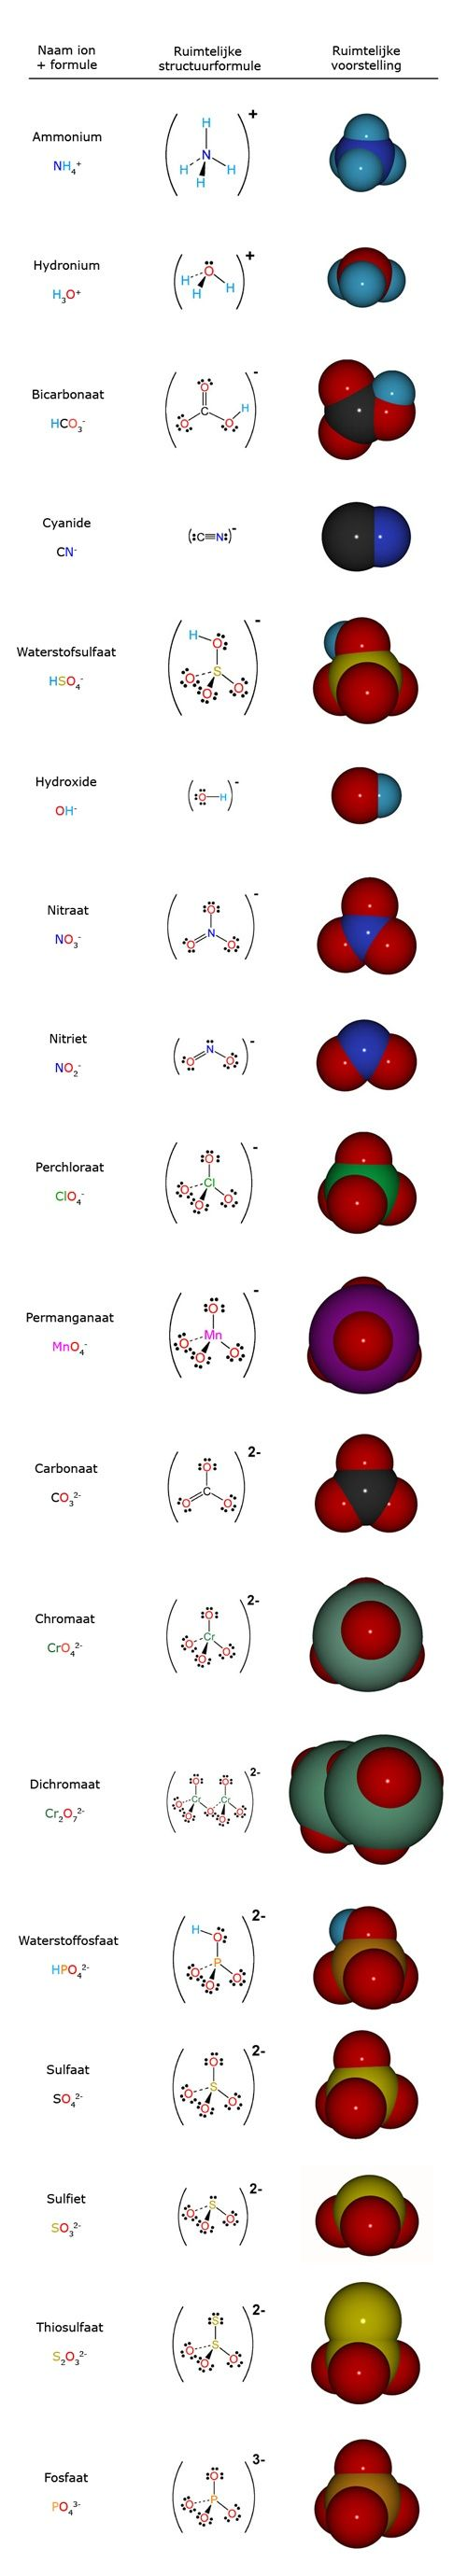 Ammonium, hydronium, bicarbonate, cyanide, hydrogen sulfate, nitrate, nitrite, perchlorate, permanganate, carbonate, chromate, dichromate, hydrogen phosphate, sulfate, sulfite, thiosulfate, and phosphate.